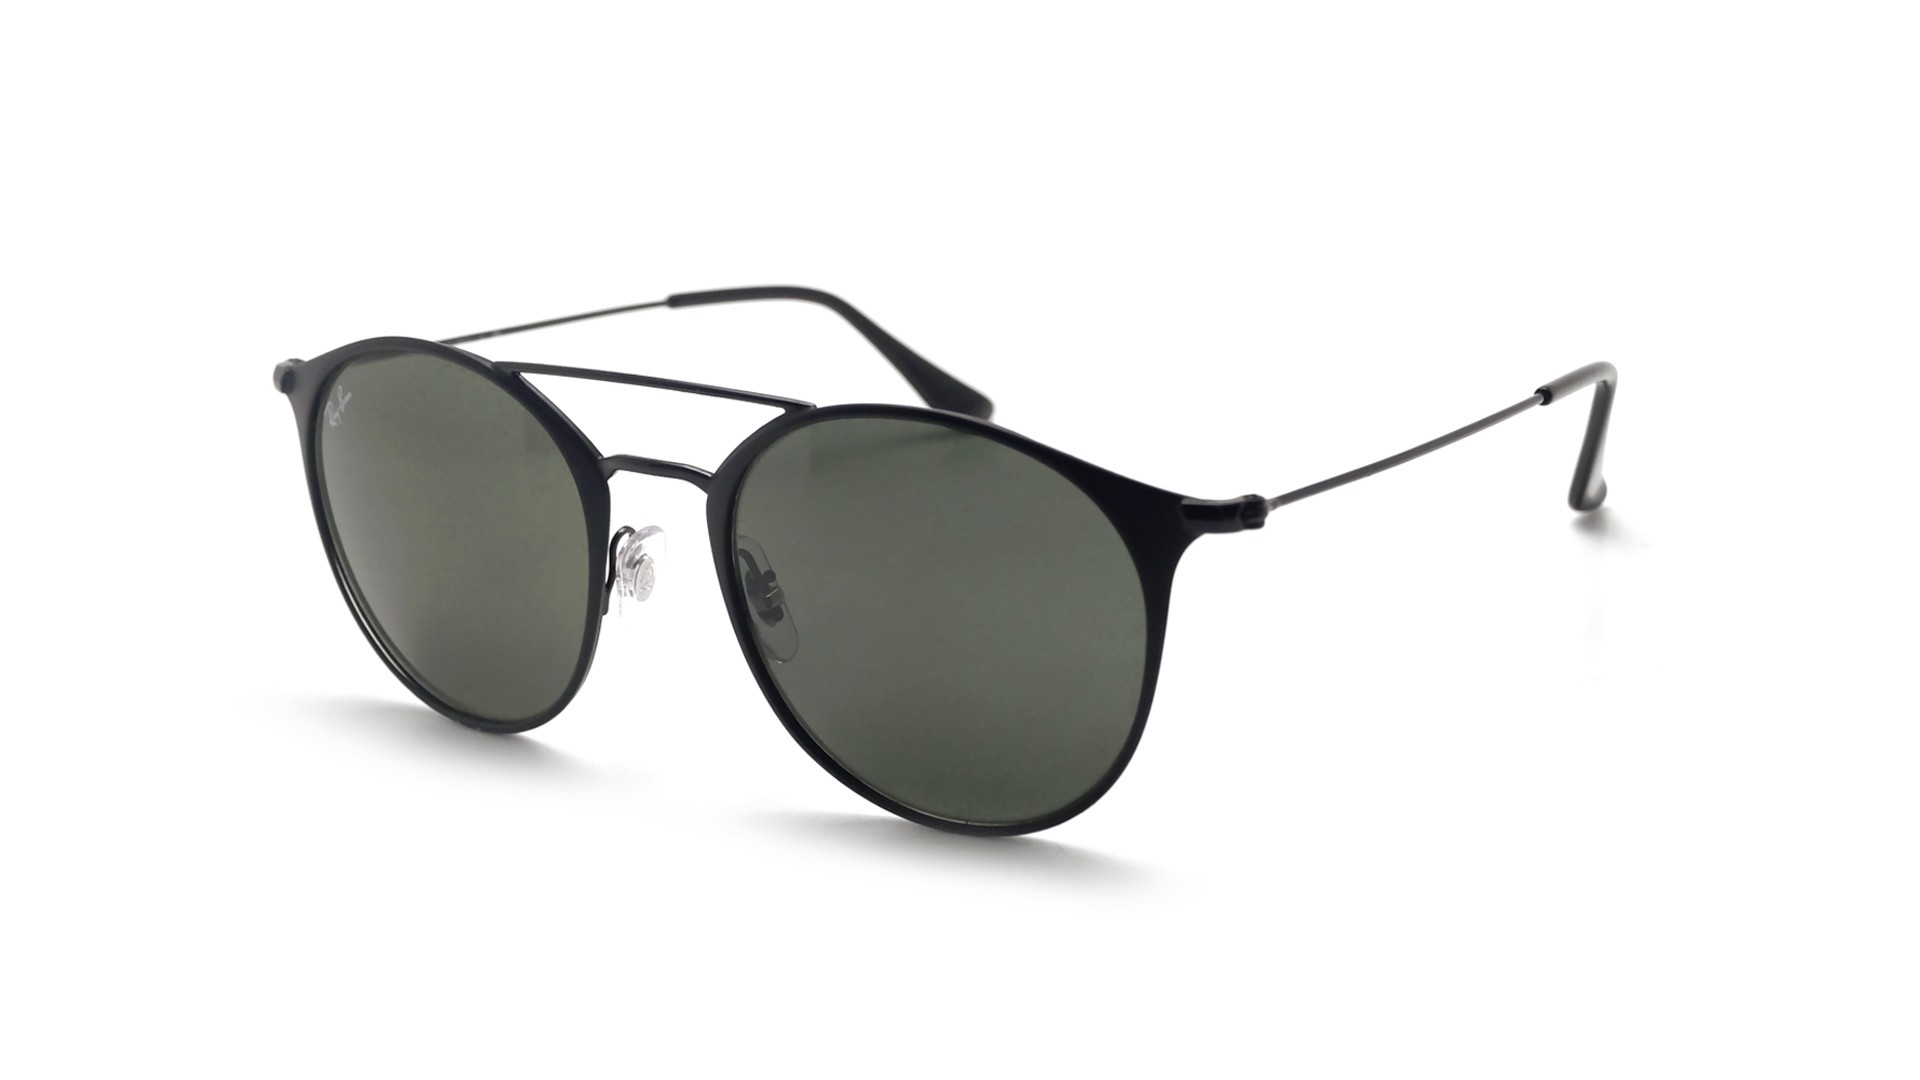 0b3a744df81 Sunglasses Ray-Ban RB3546 186 52-20 Black Matte Medium